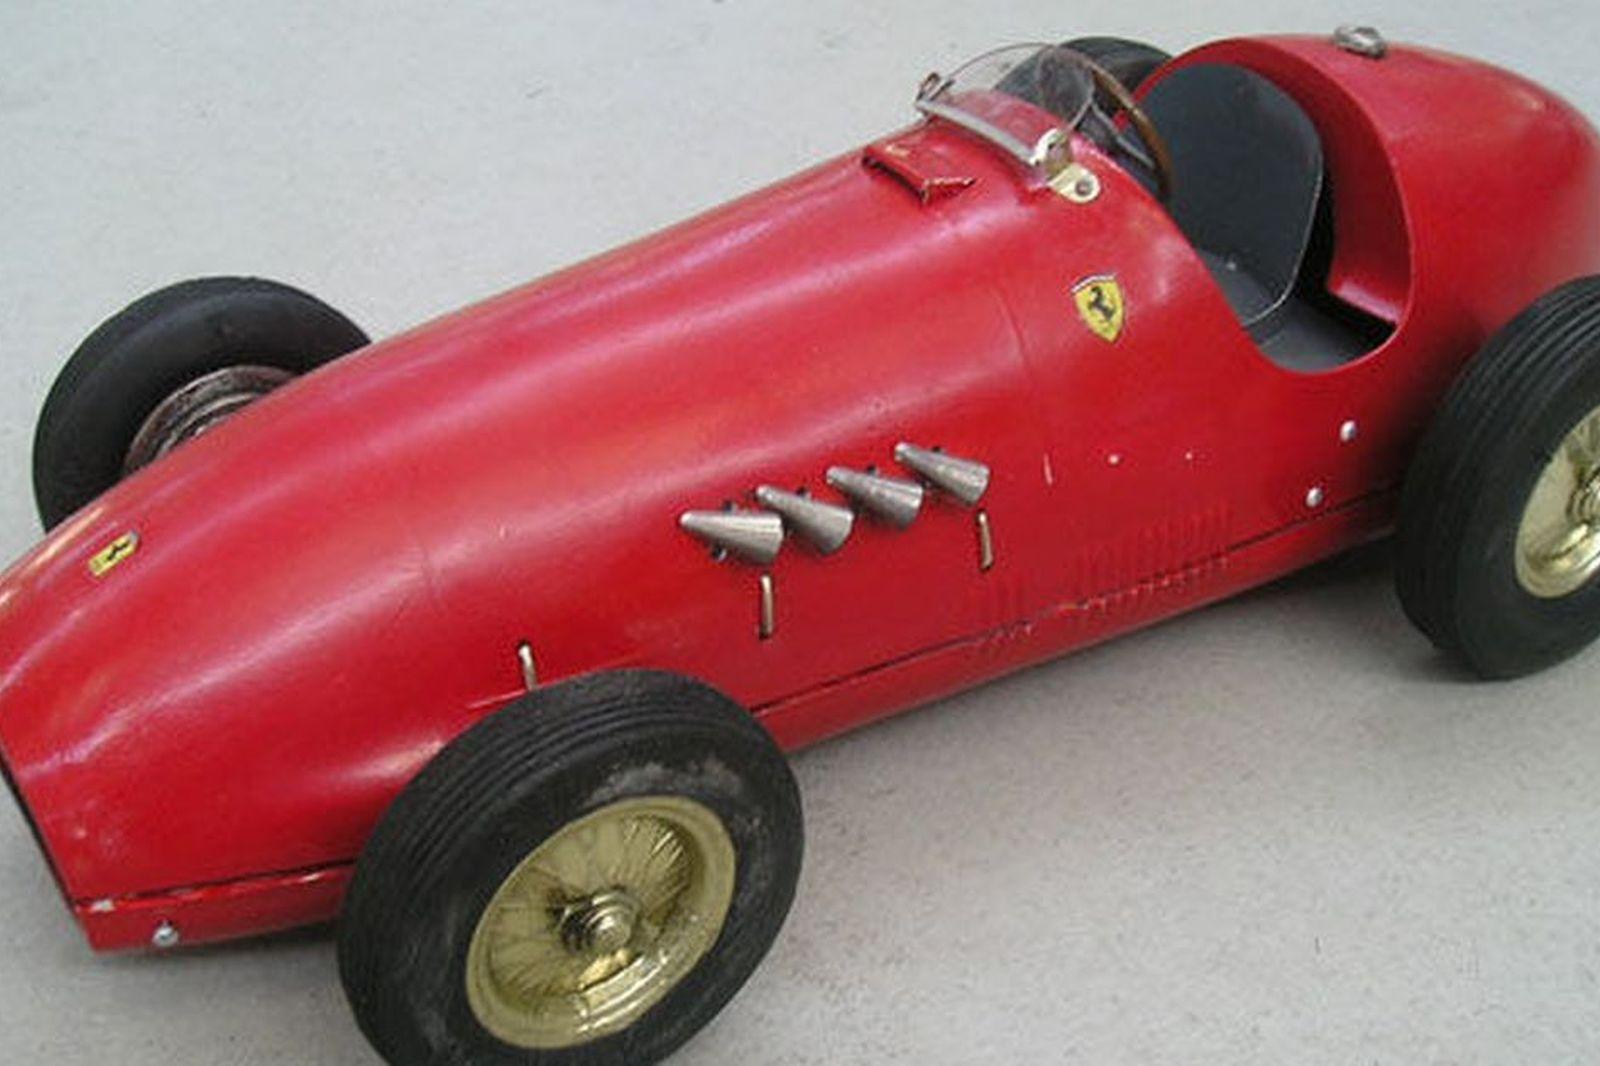 Resultado de imagen de Ferrari formula 1